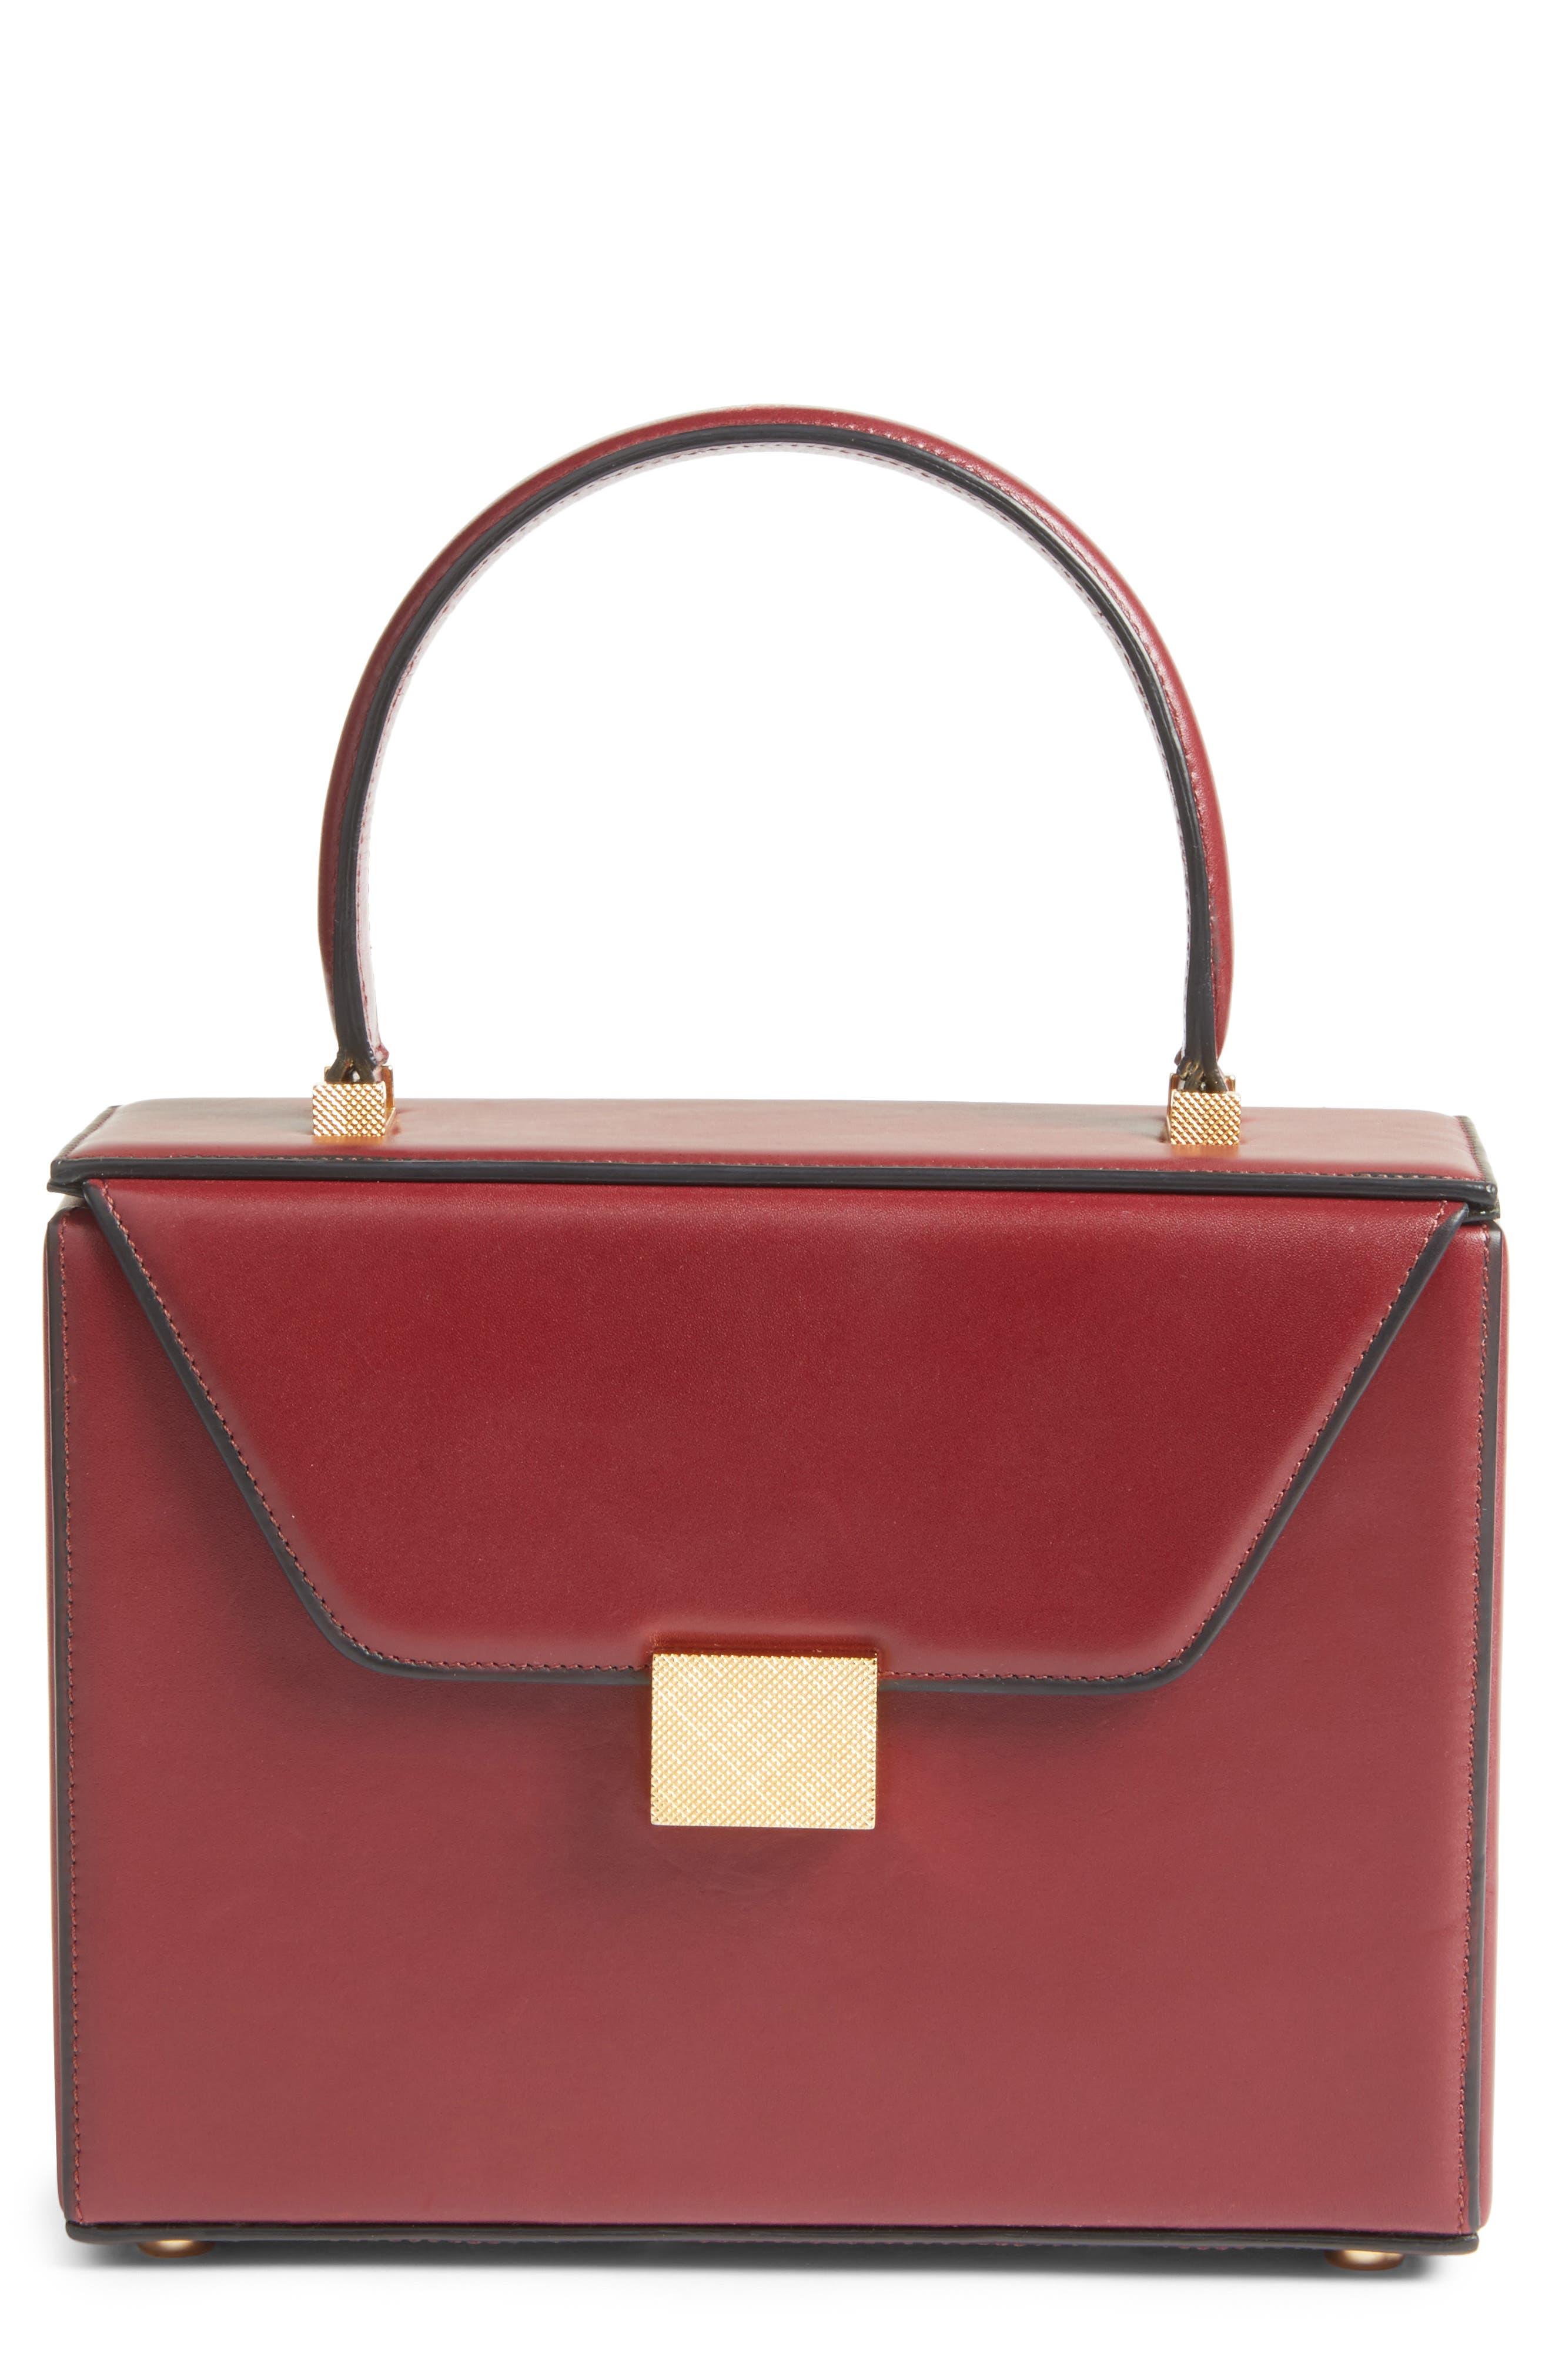 Alternate Image 1 Selected - Victoria Beckham Mini Vanity Top Handle Box Bag